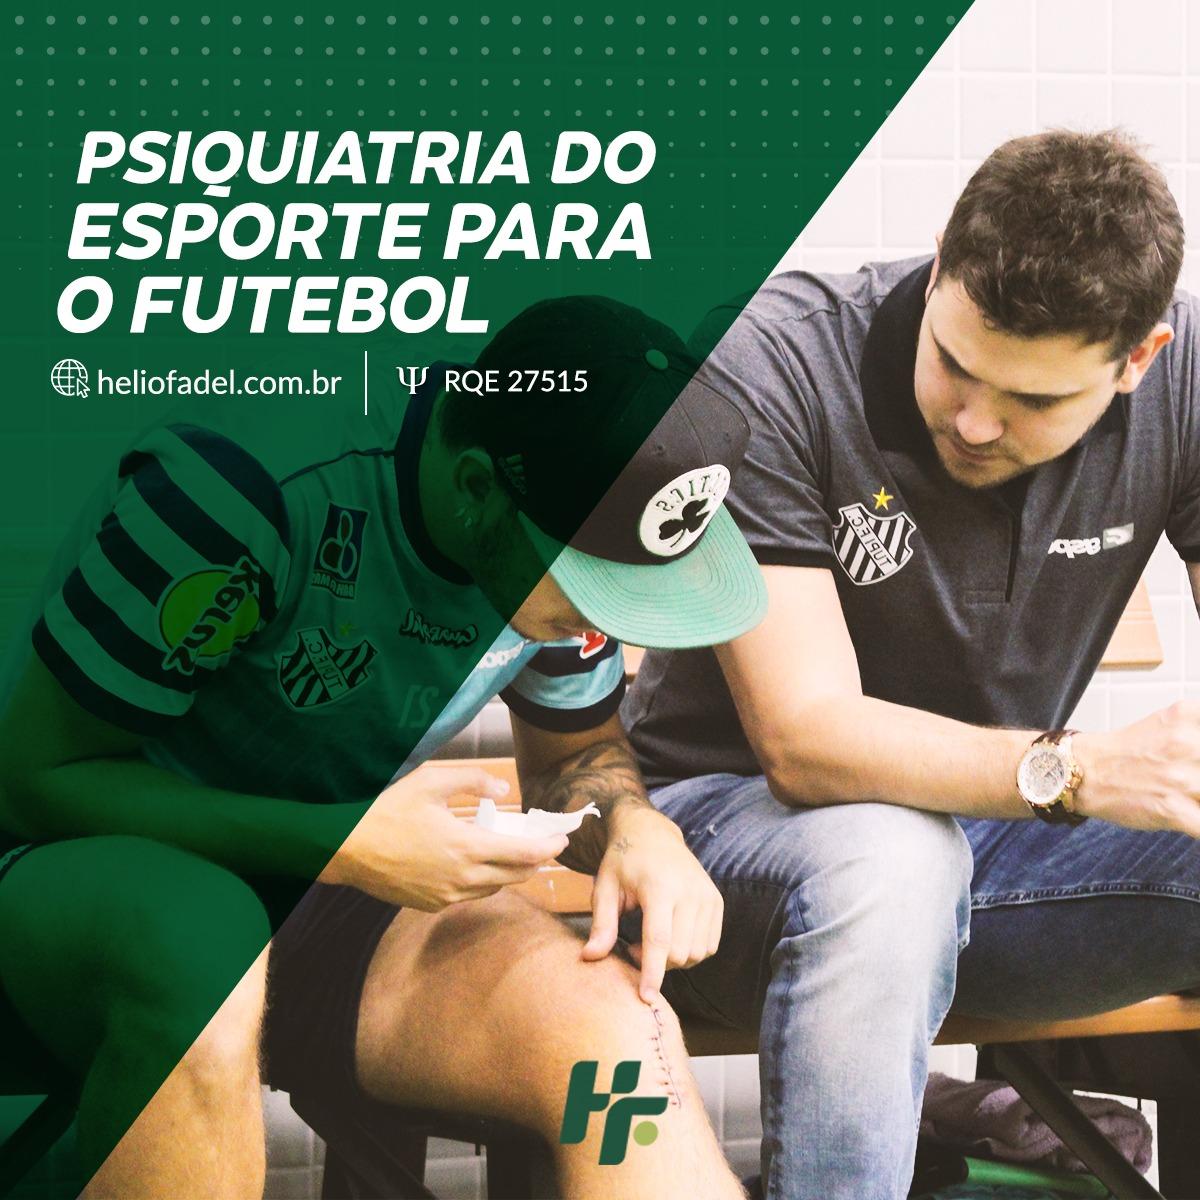 psiquiatra esporte futebol